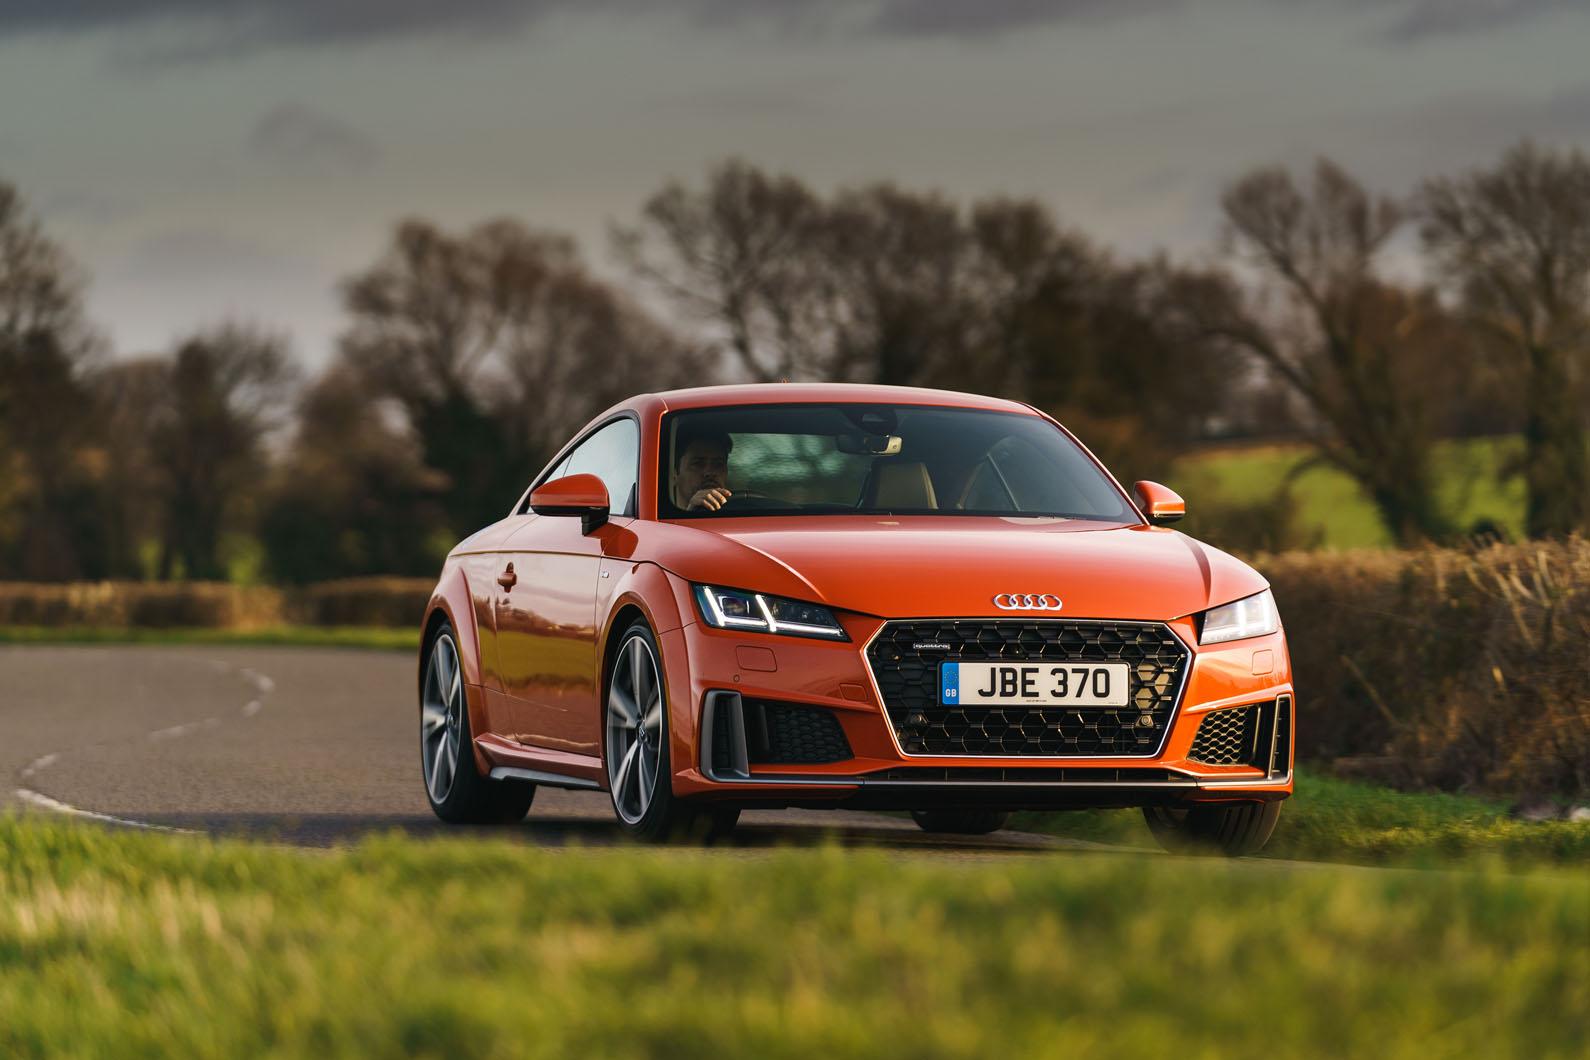 Kelebihan Kekurangan Audi Tt Coupe Murah Berkualitas